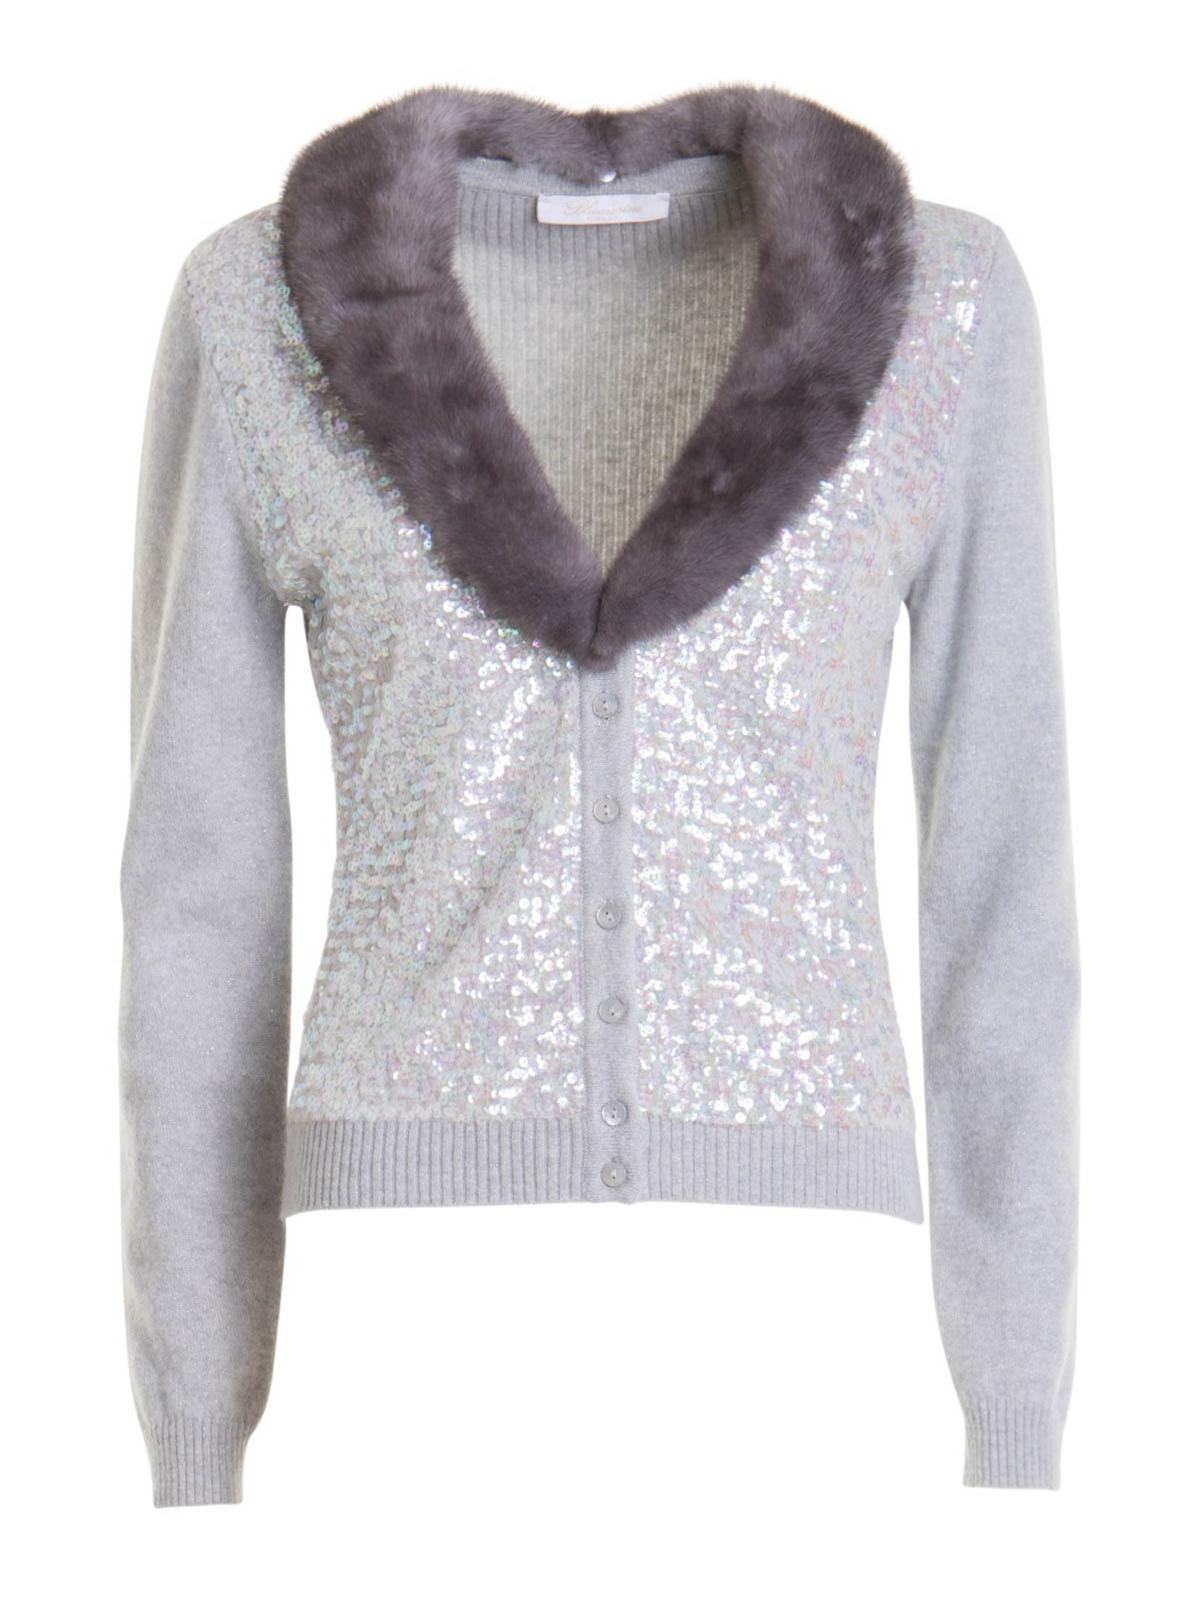 Blumarine Wools WOOL CASHMERE BLEND CARDIGAN